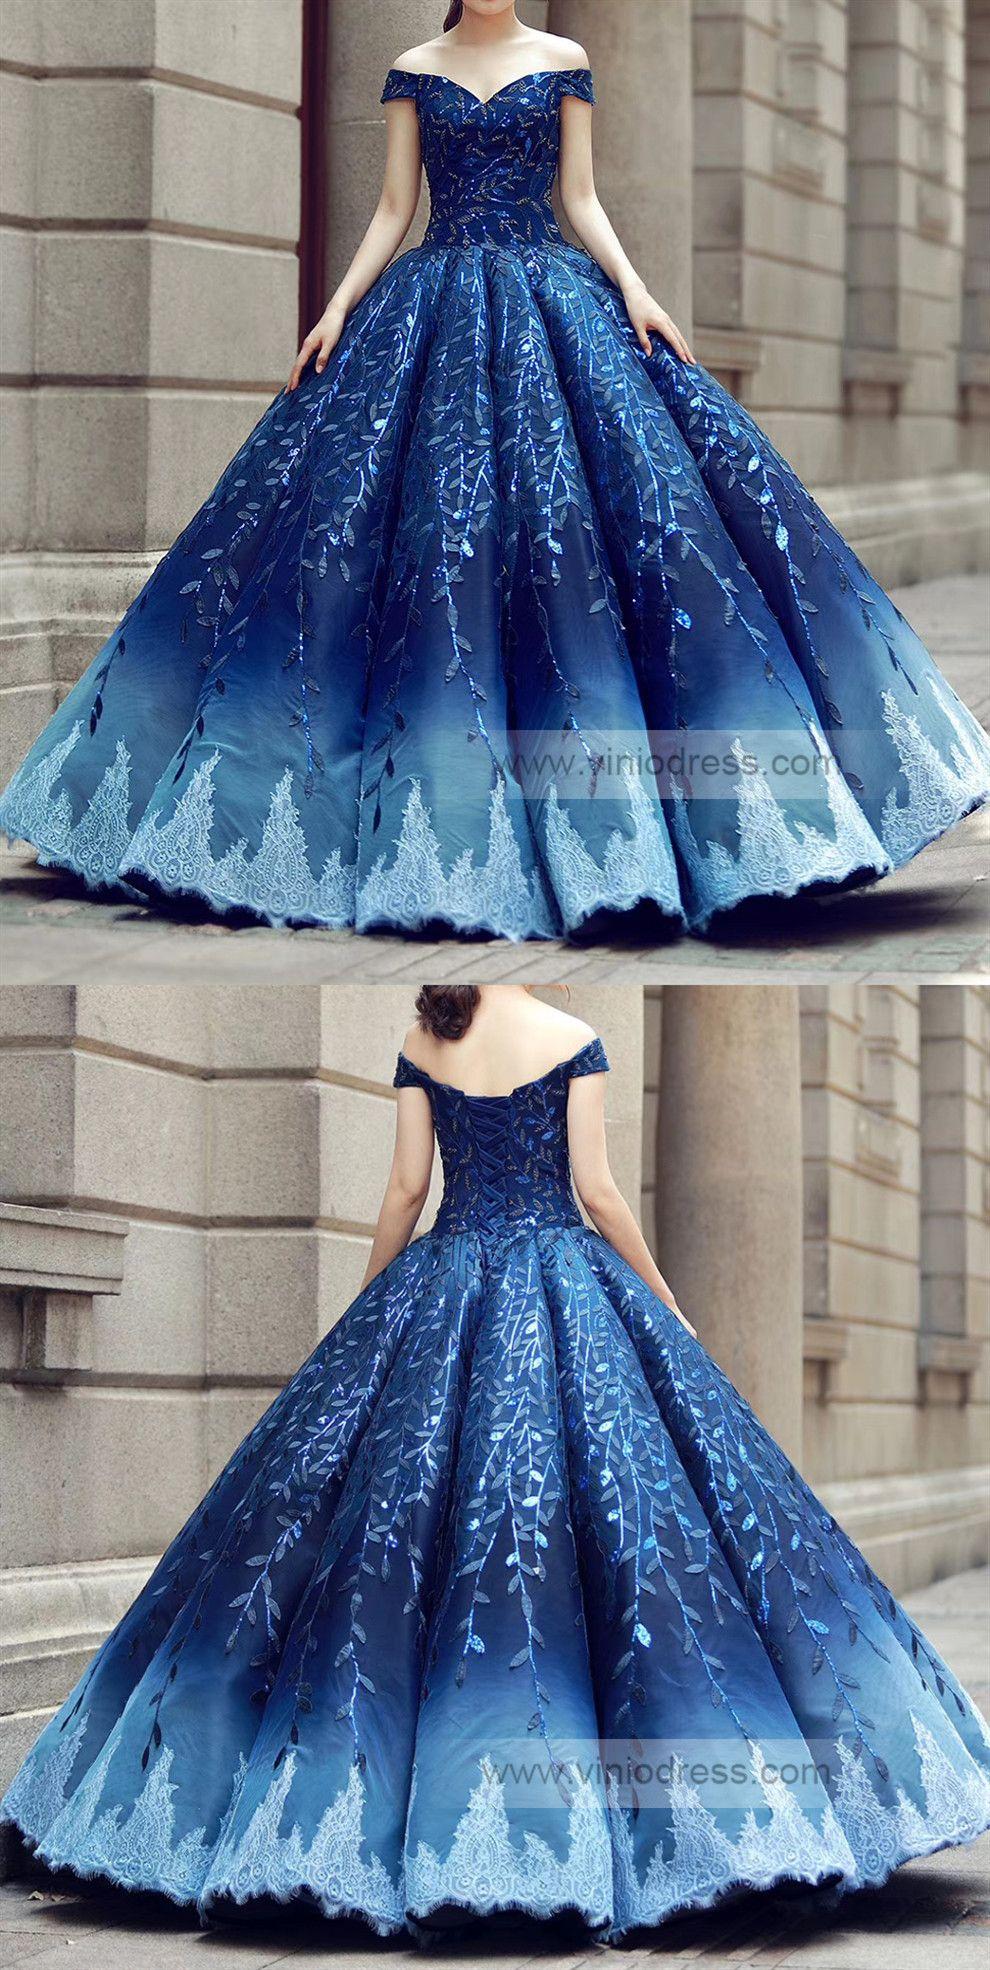 33++ Blue princess dress info